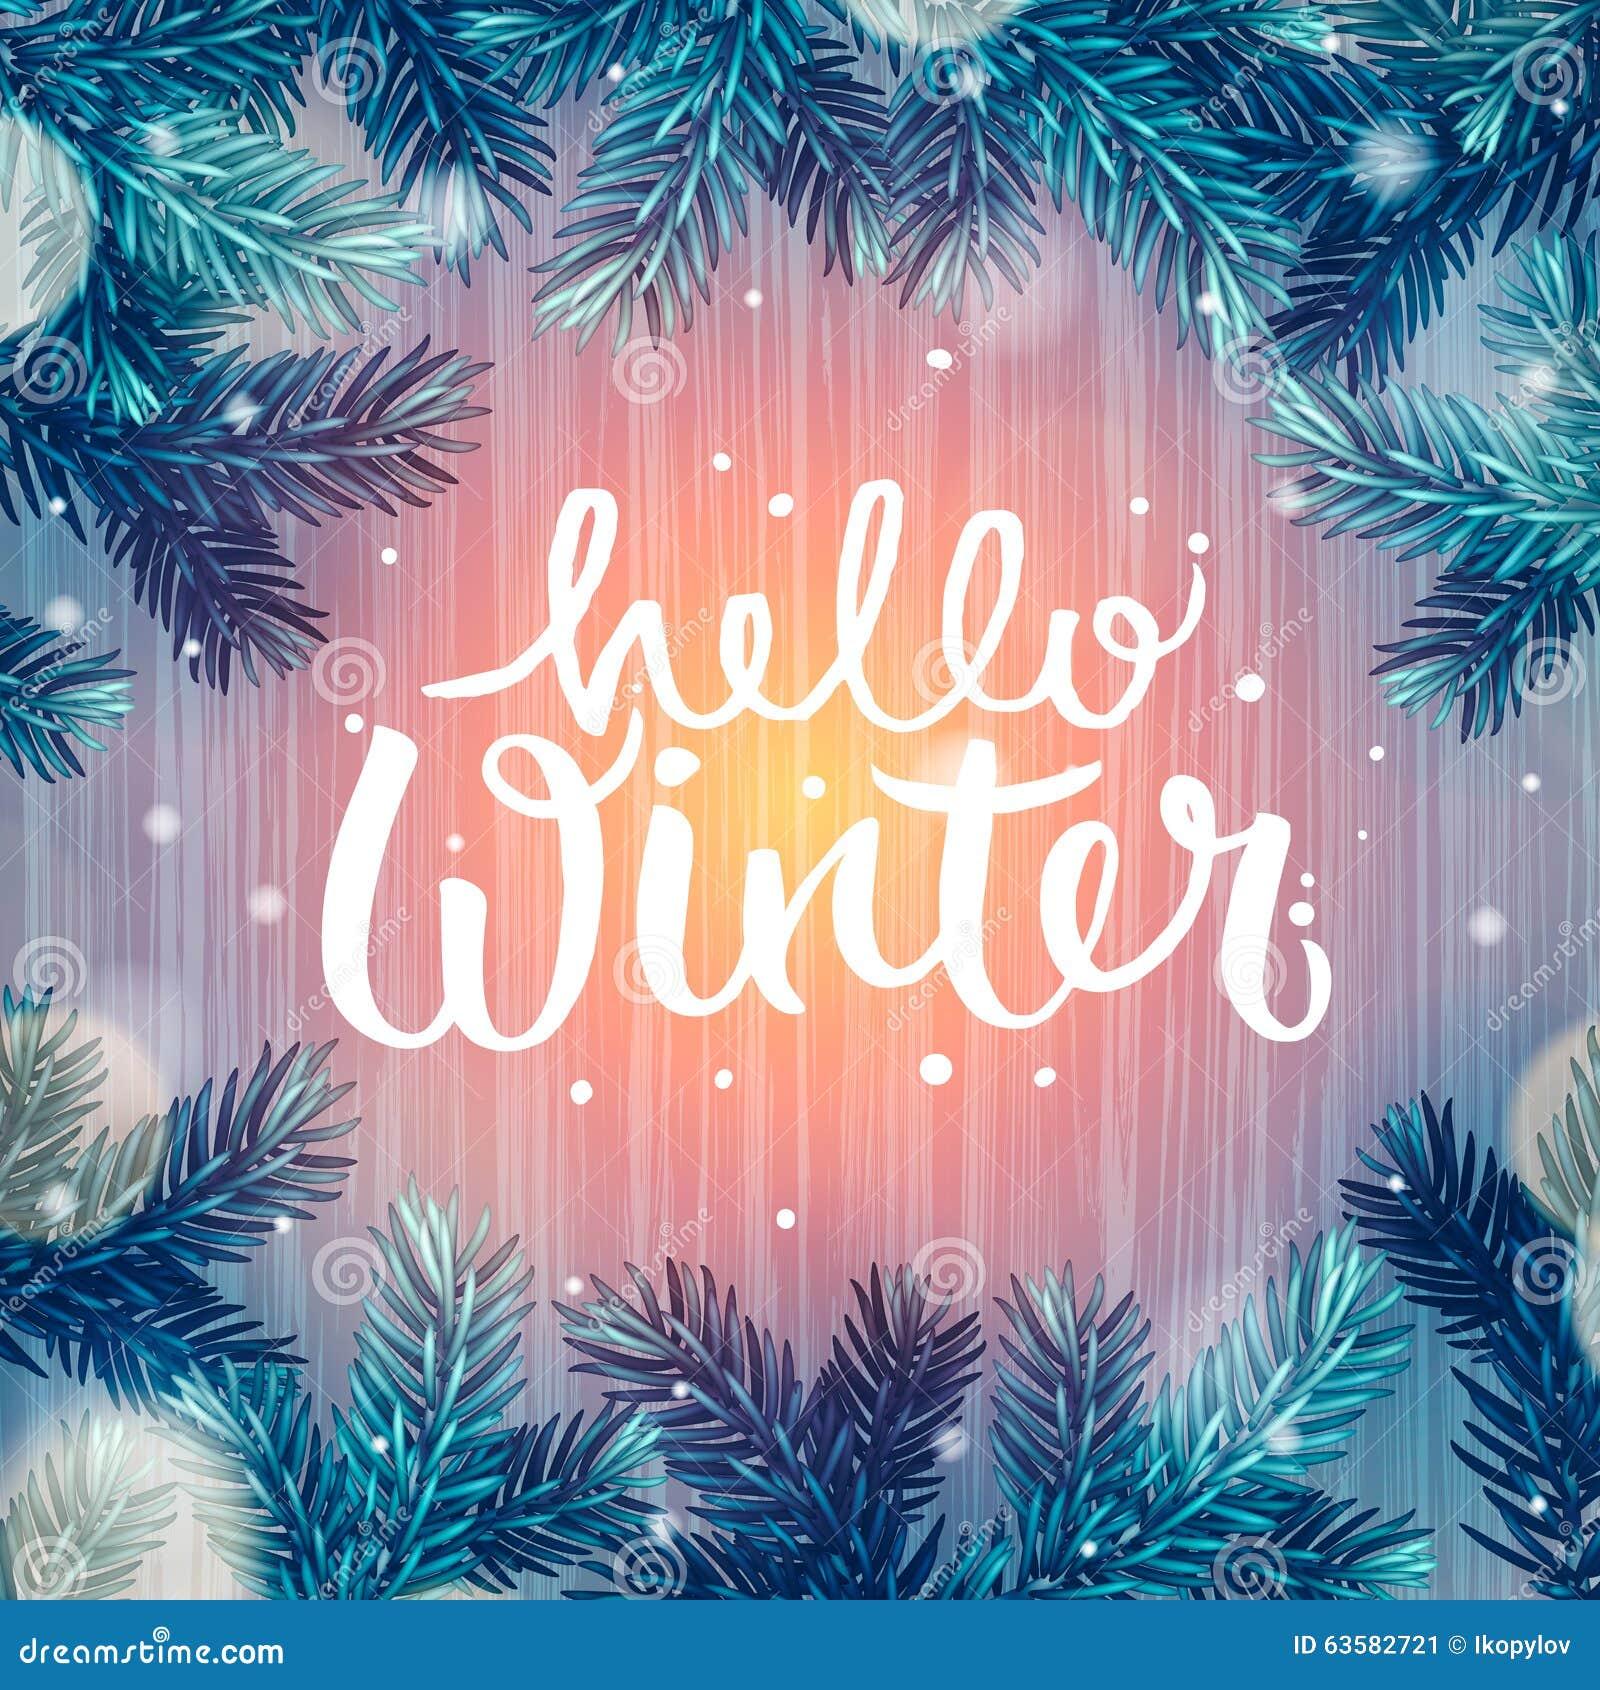 hello winter  holiday background  christmas stock vector clip art kitten images clip art kitten pictures